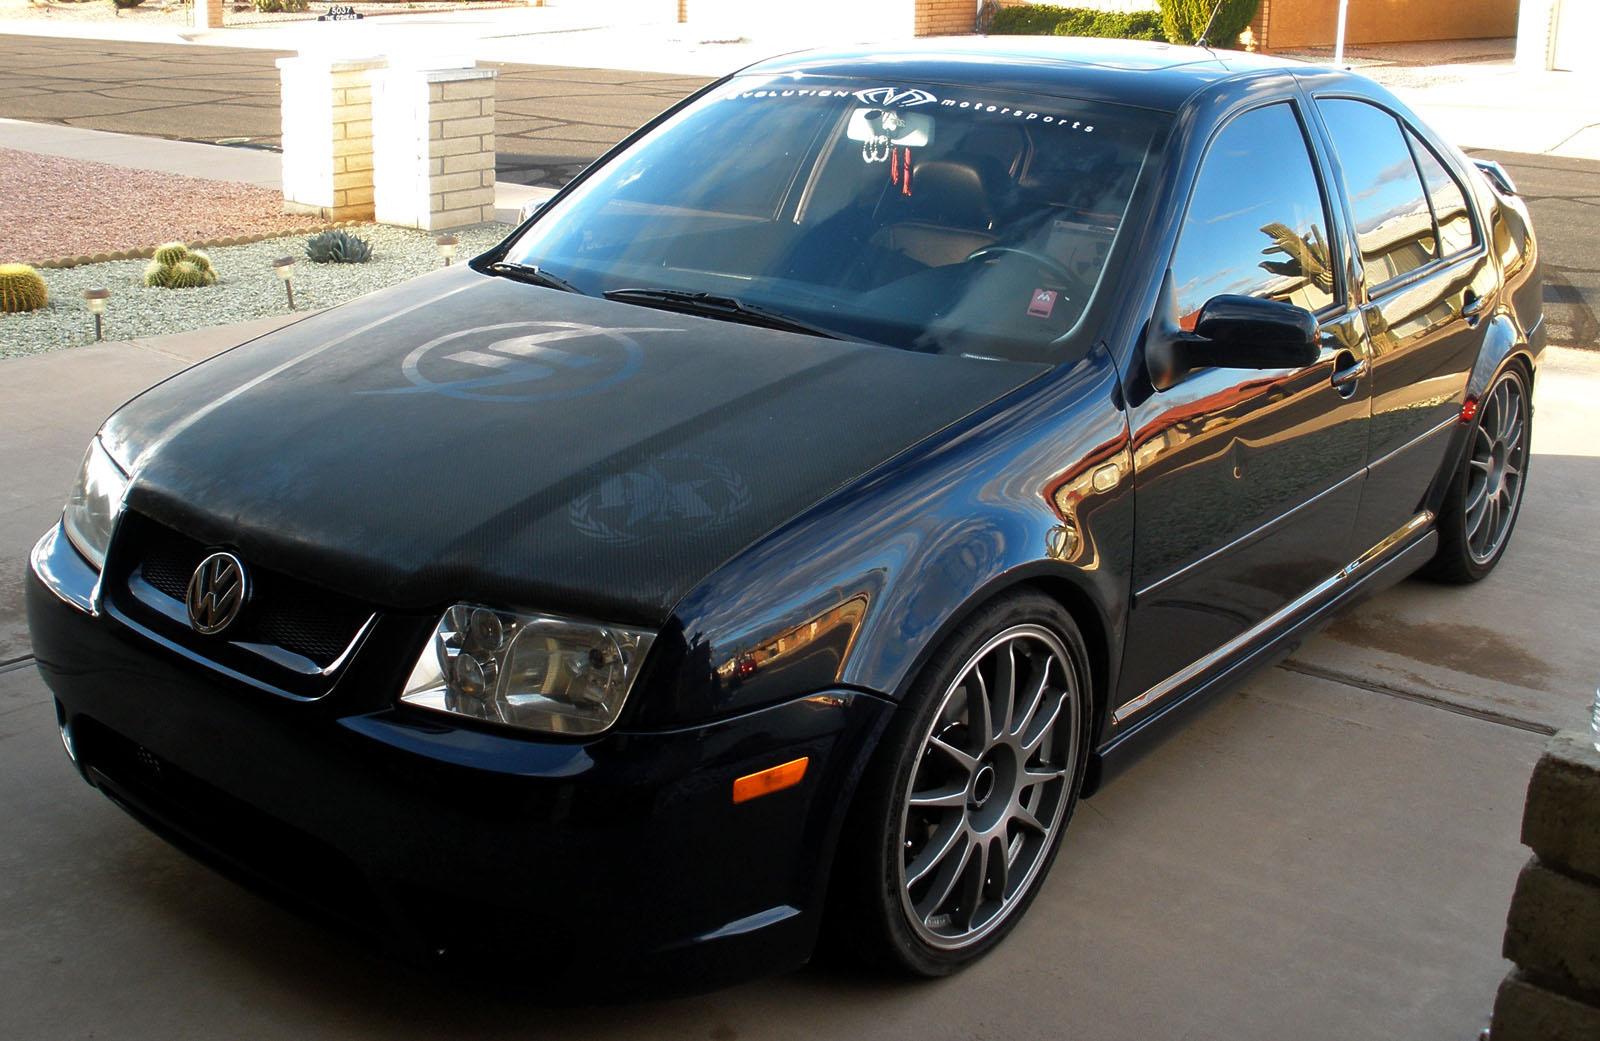 2000 Volkswagen Jetta GLS VR6 For Sale   Tempe Arizona